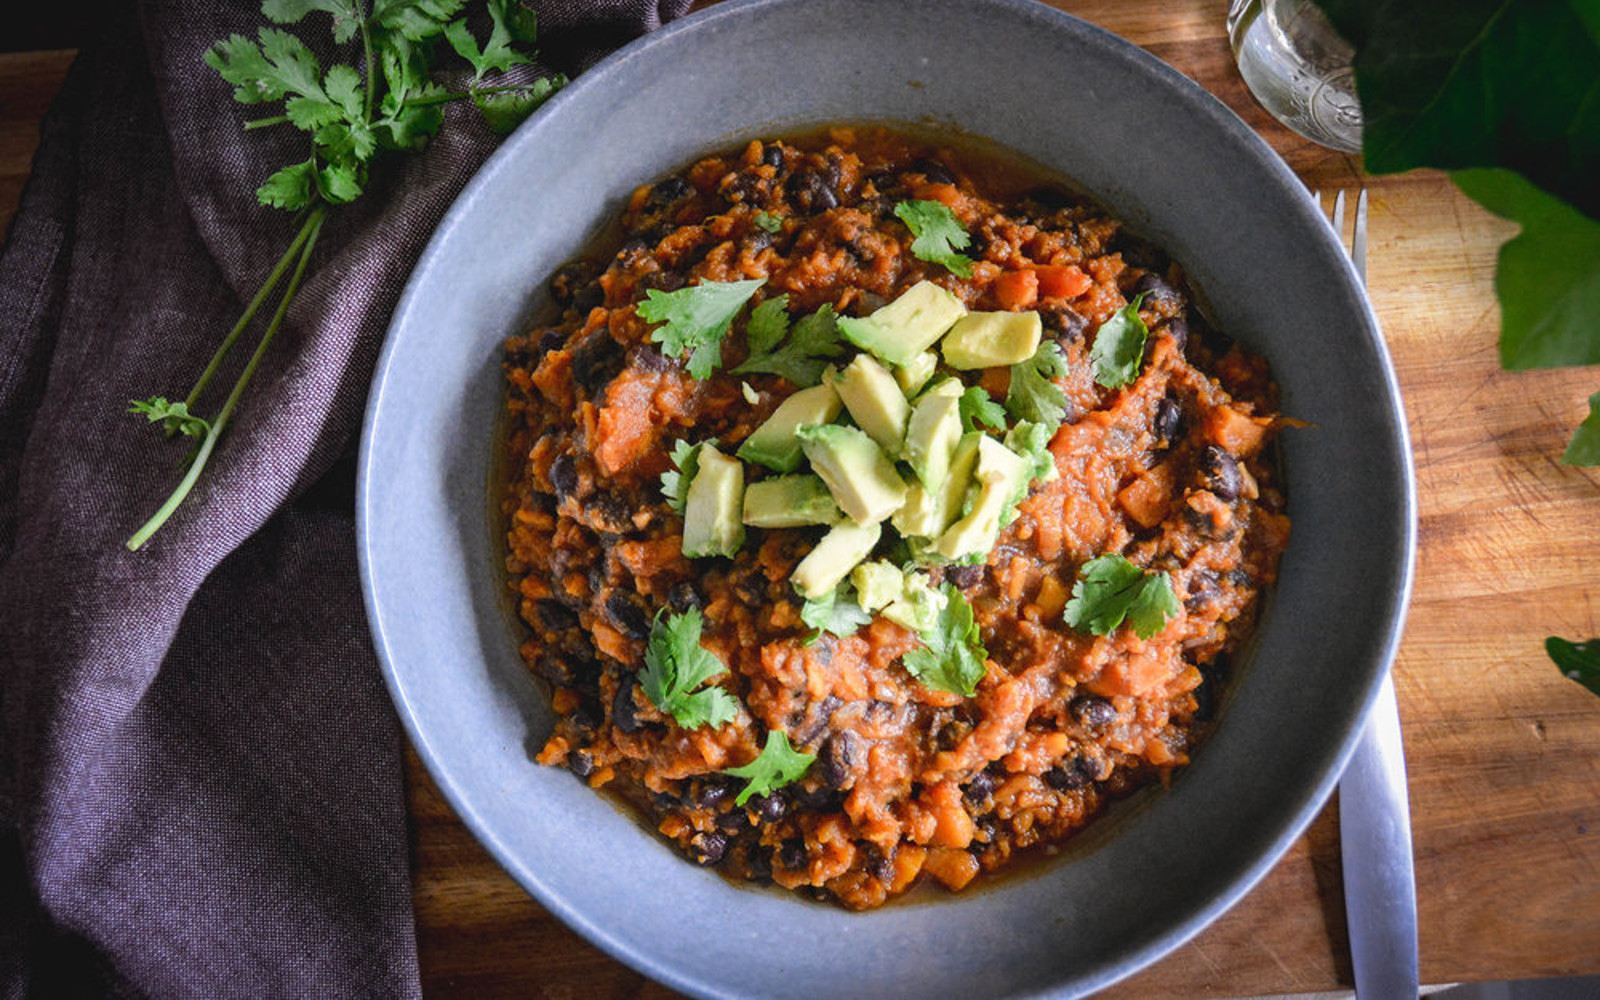 Vegan Gluten-Free Sweet Potato Chili topped with herbs and avocado